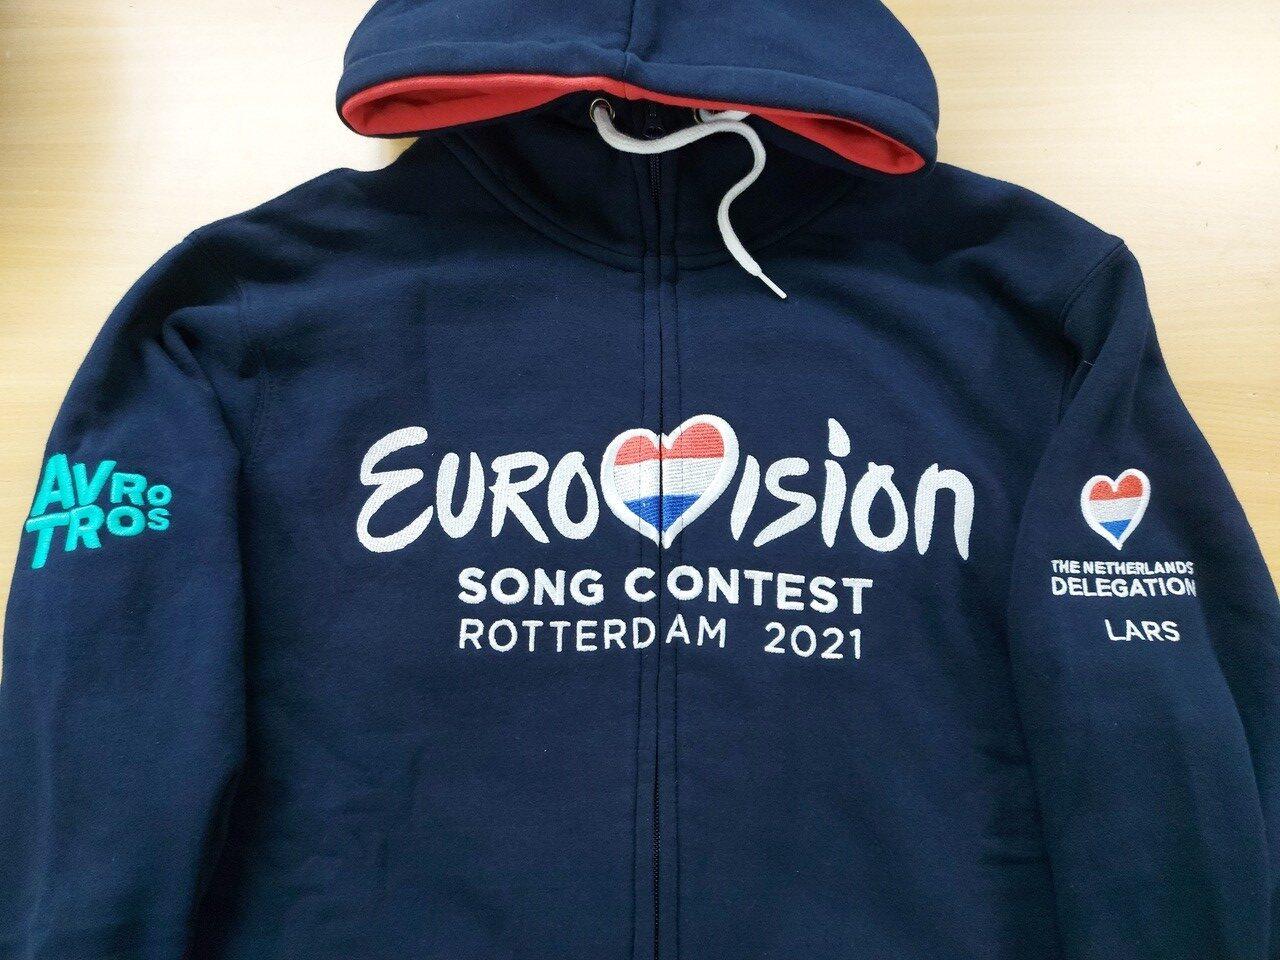 'Nu meer binding met Songfestival'